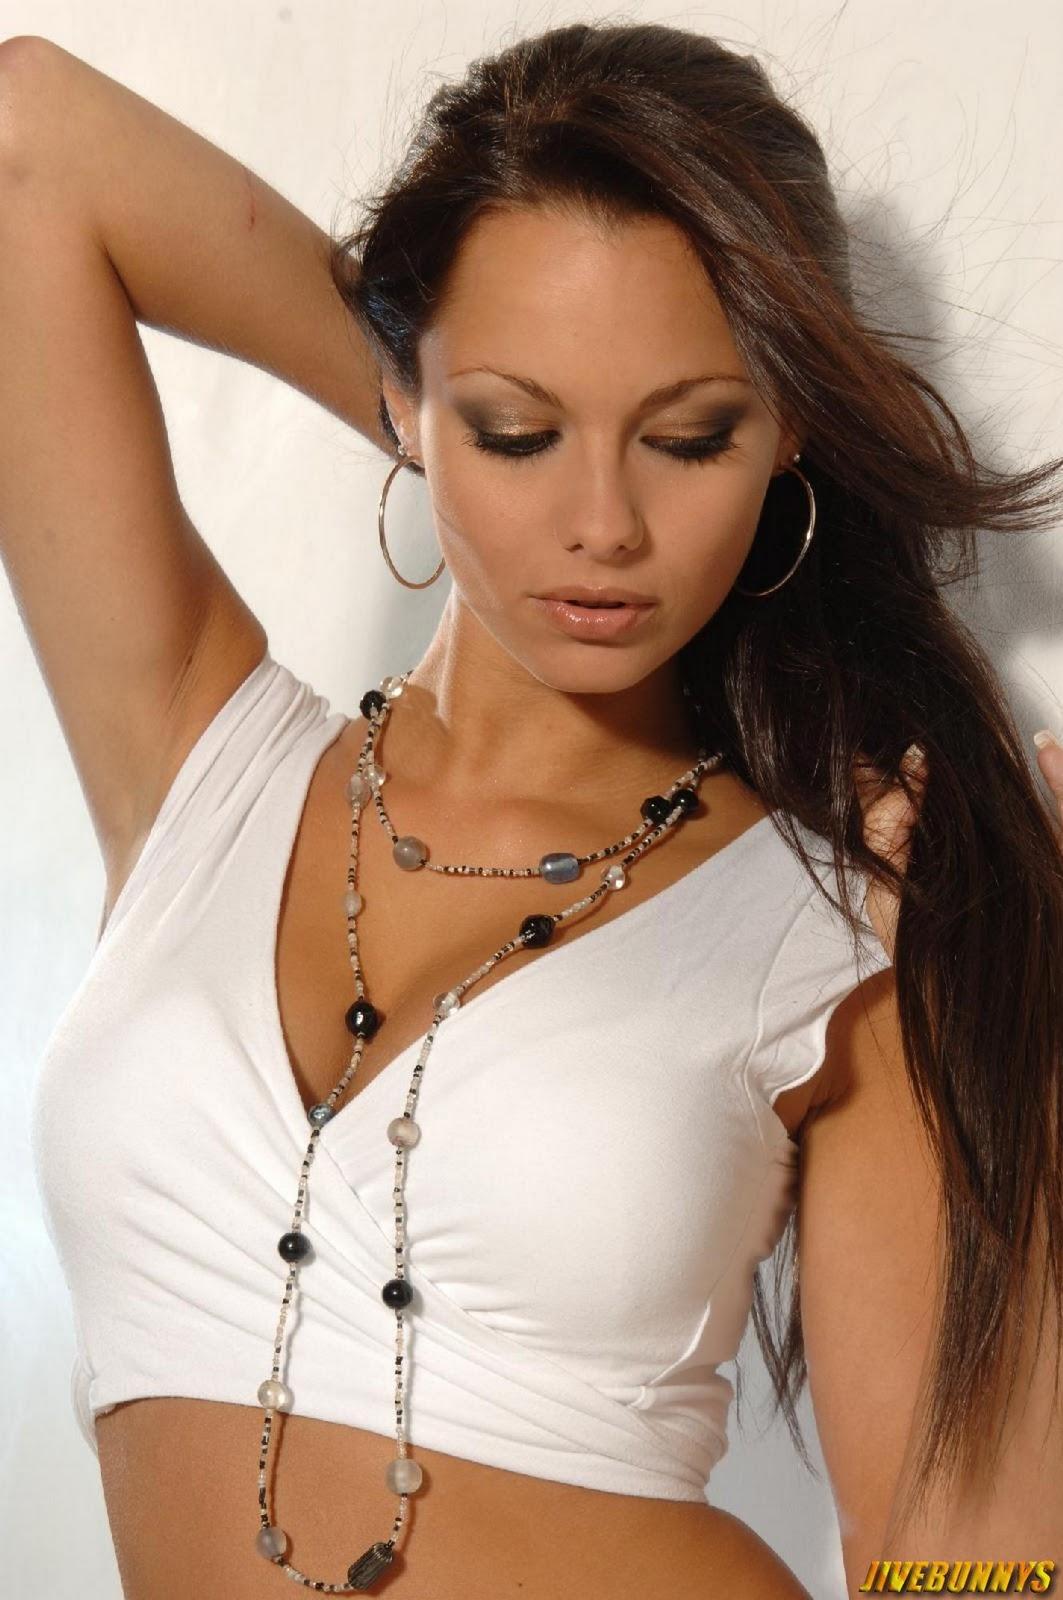 http://2.bp.blogspot.com/-VvVXaWqhzBs/Tw0nNp2UncI/AAAAAAAD_OY/Ka53psXZ2SI/s1600/jessica_jane_clement_400161.jpg